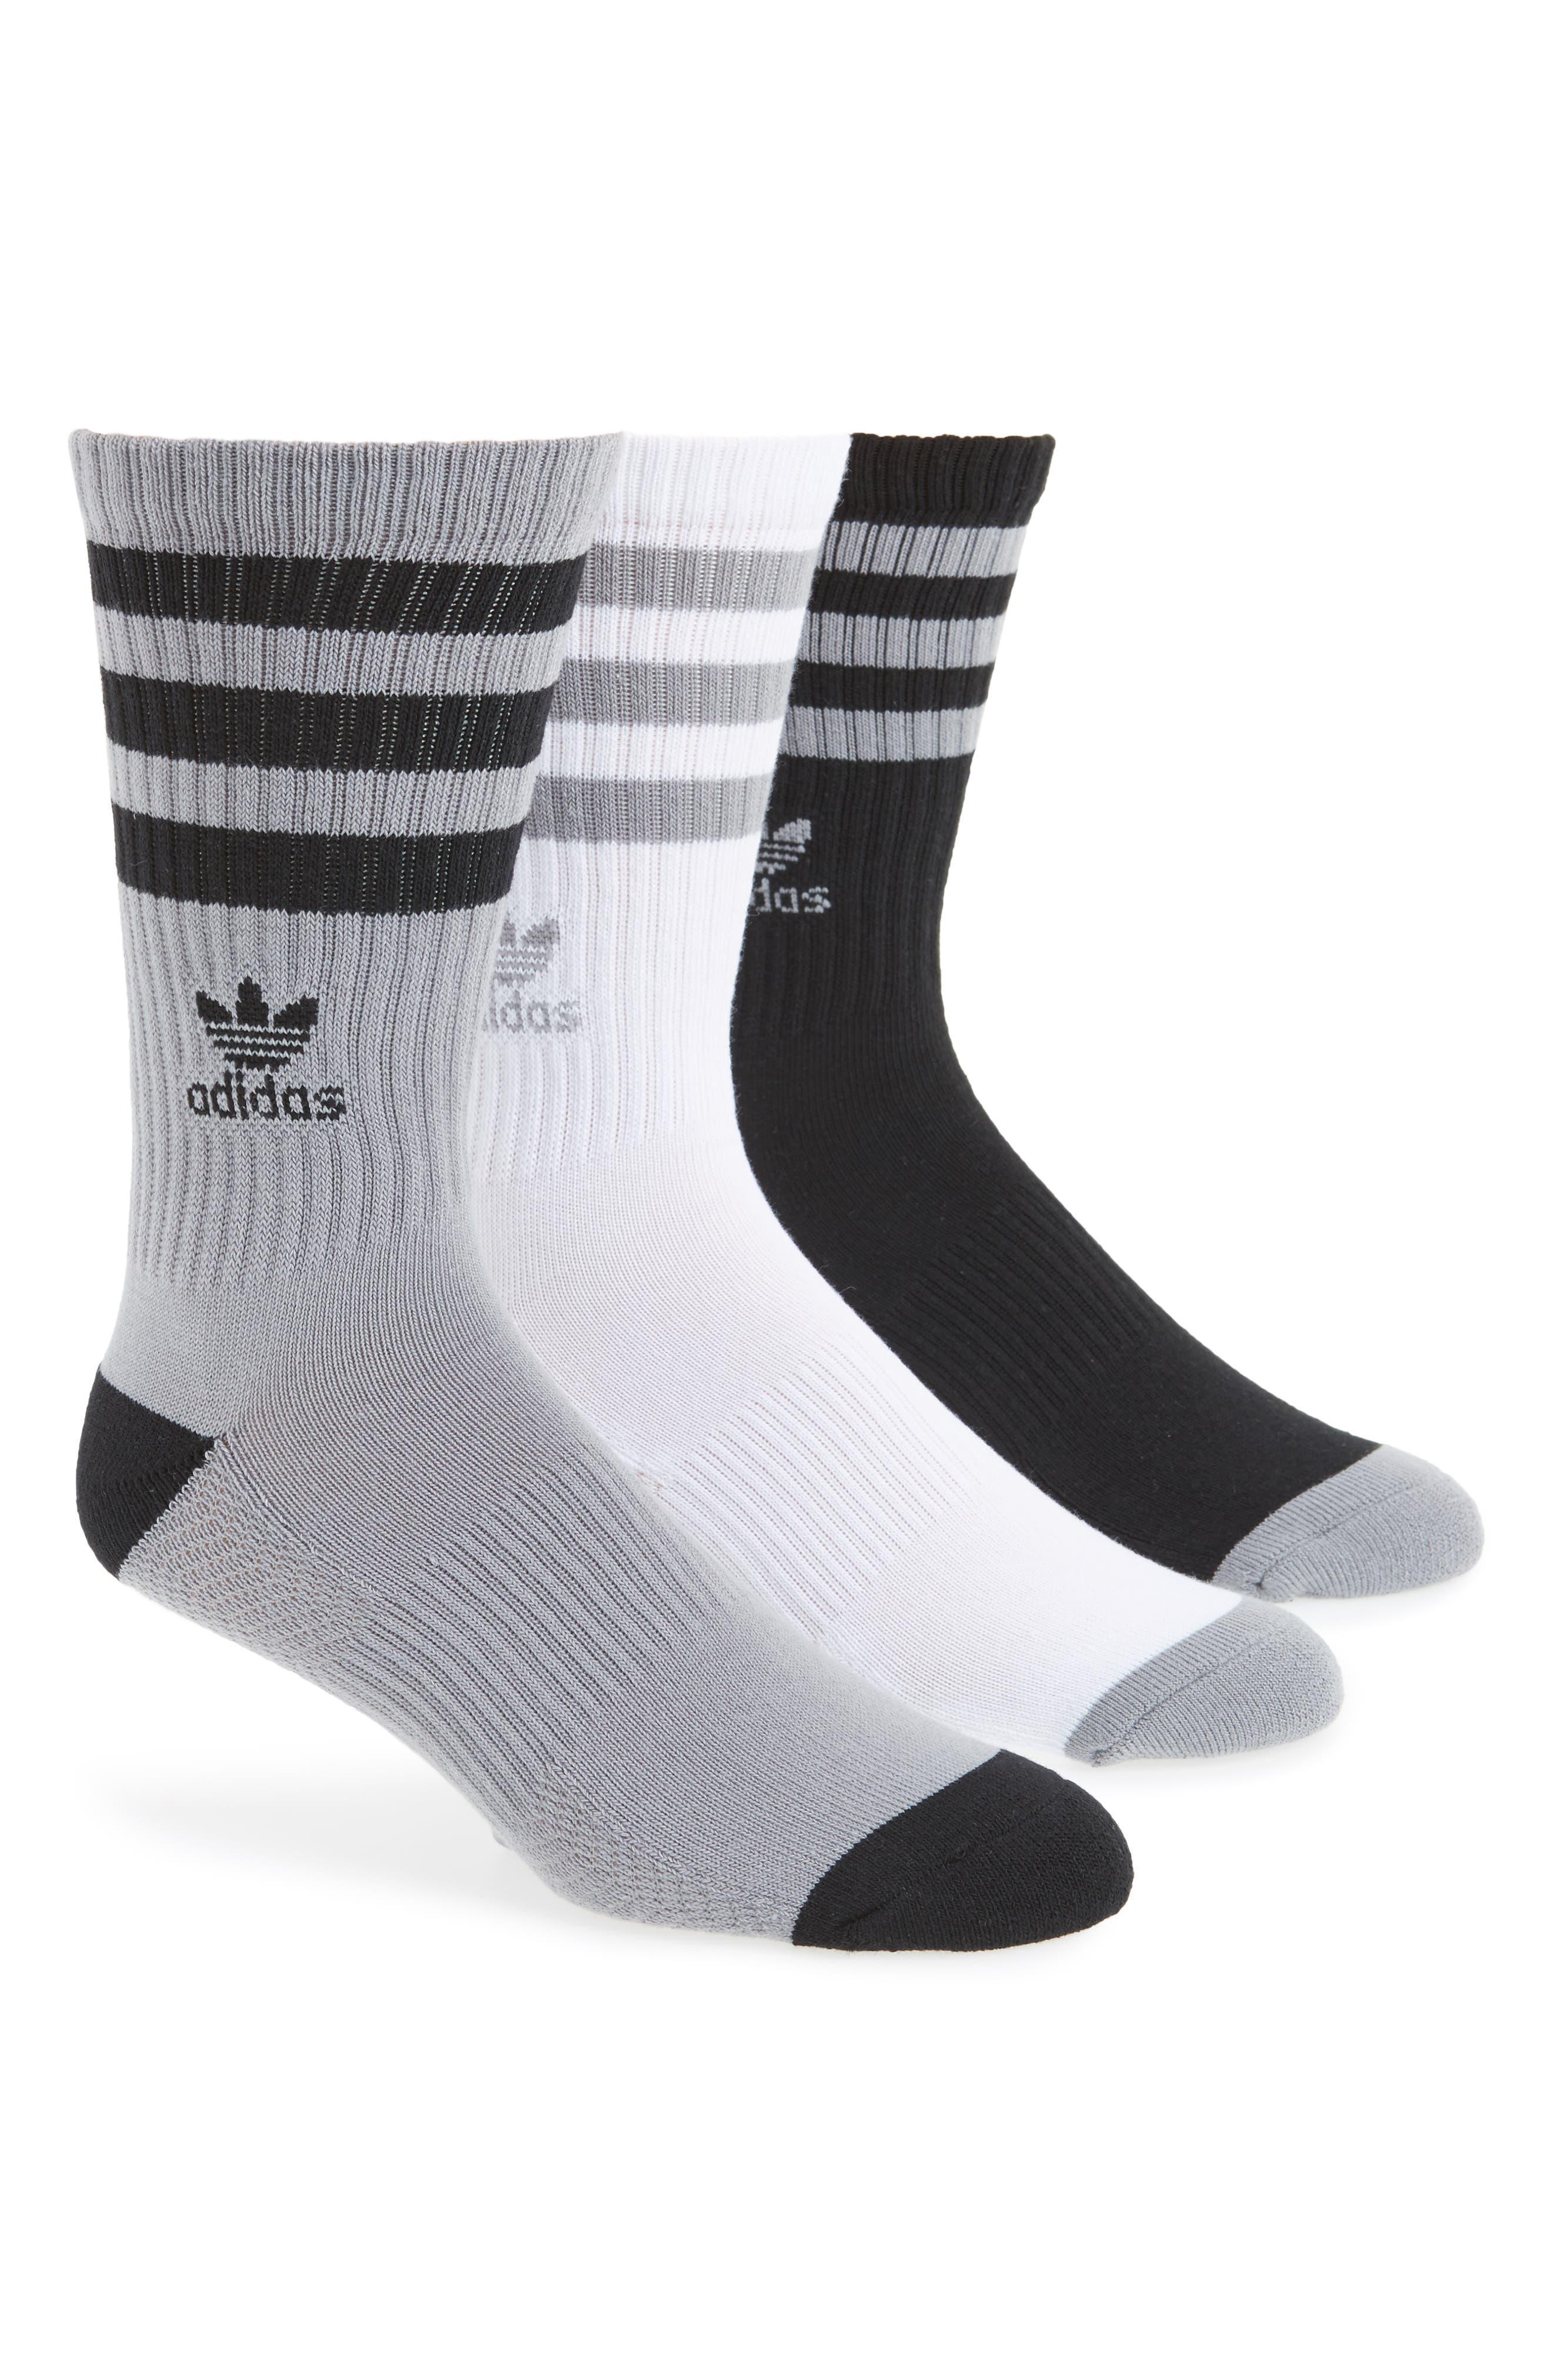 Main Image - adidas Originals 3-Pack Ribbed Crew Socks